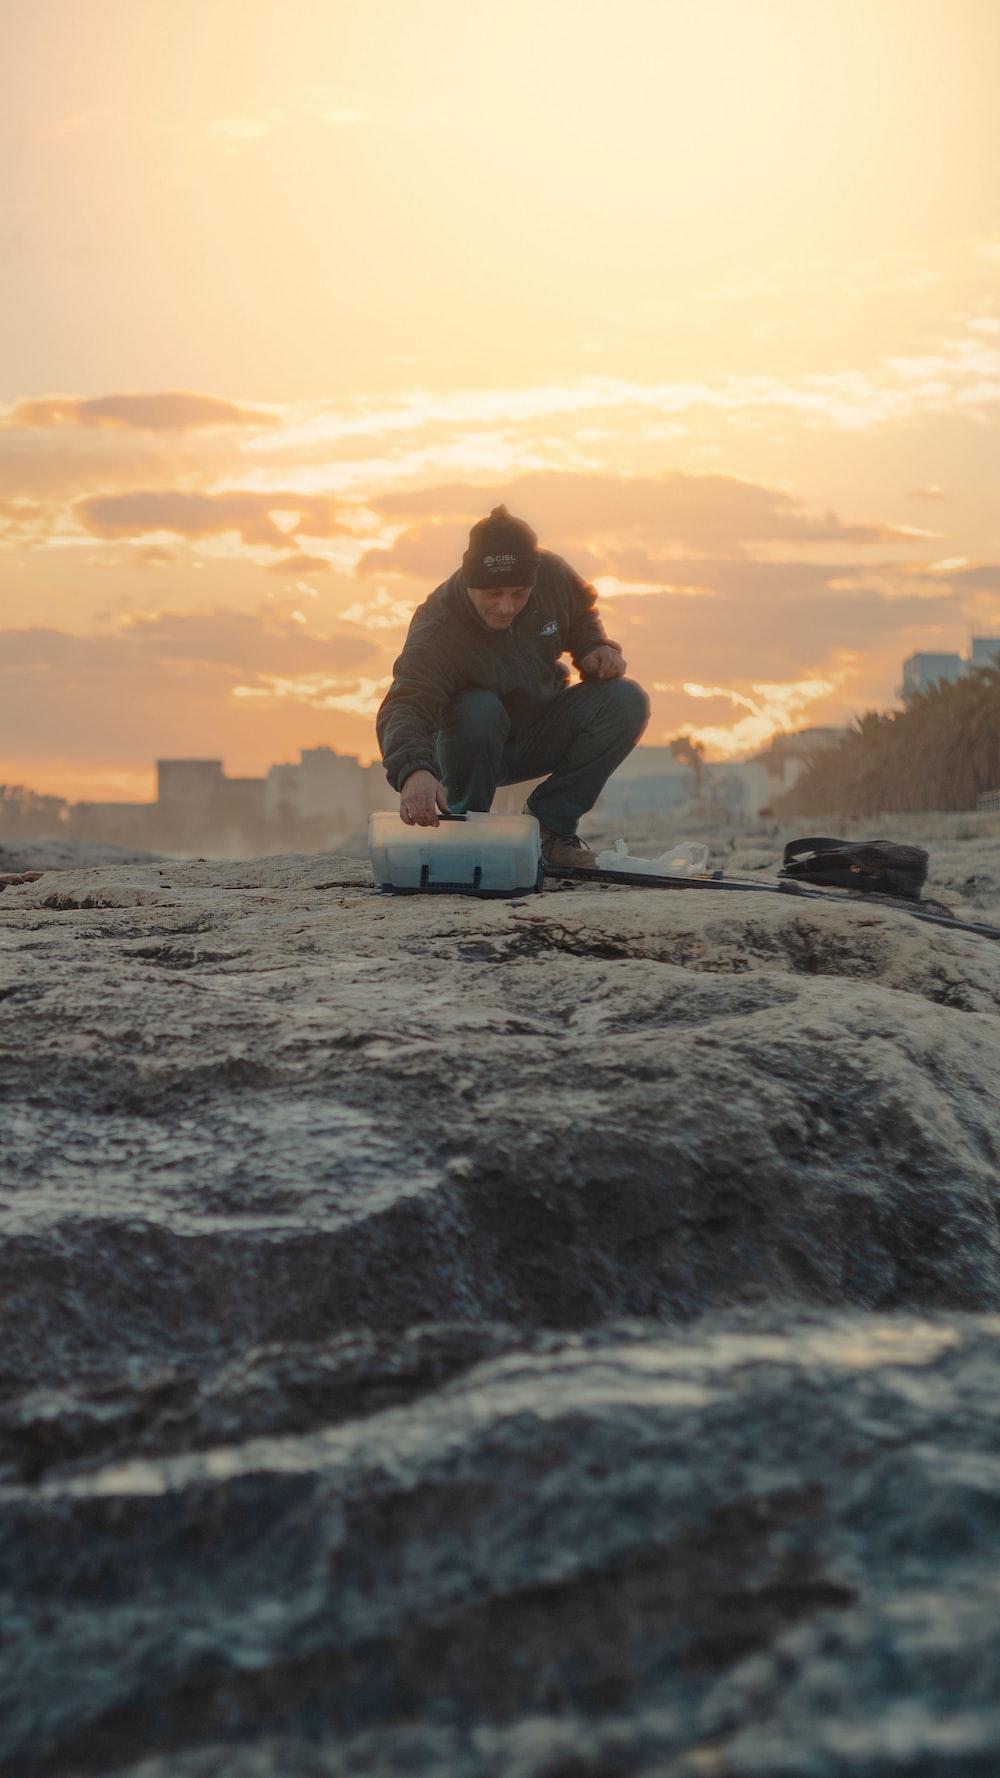 man in black jacket sitting on rock